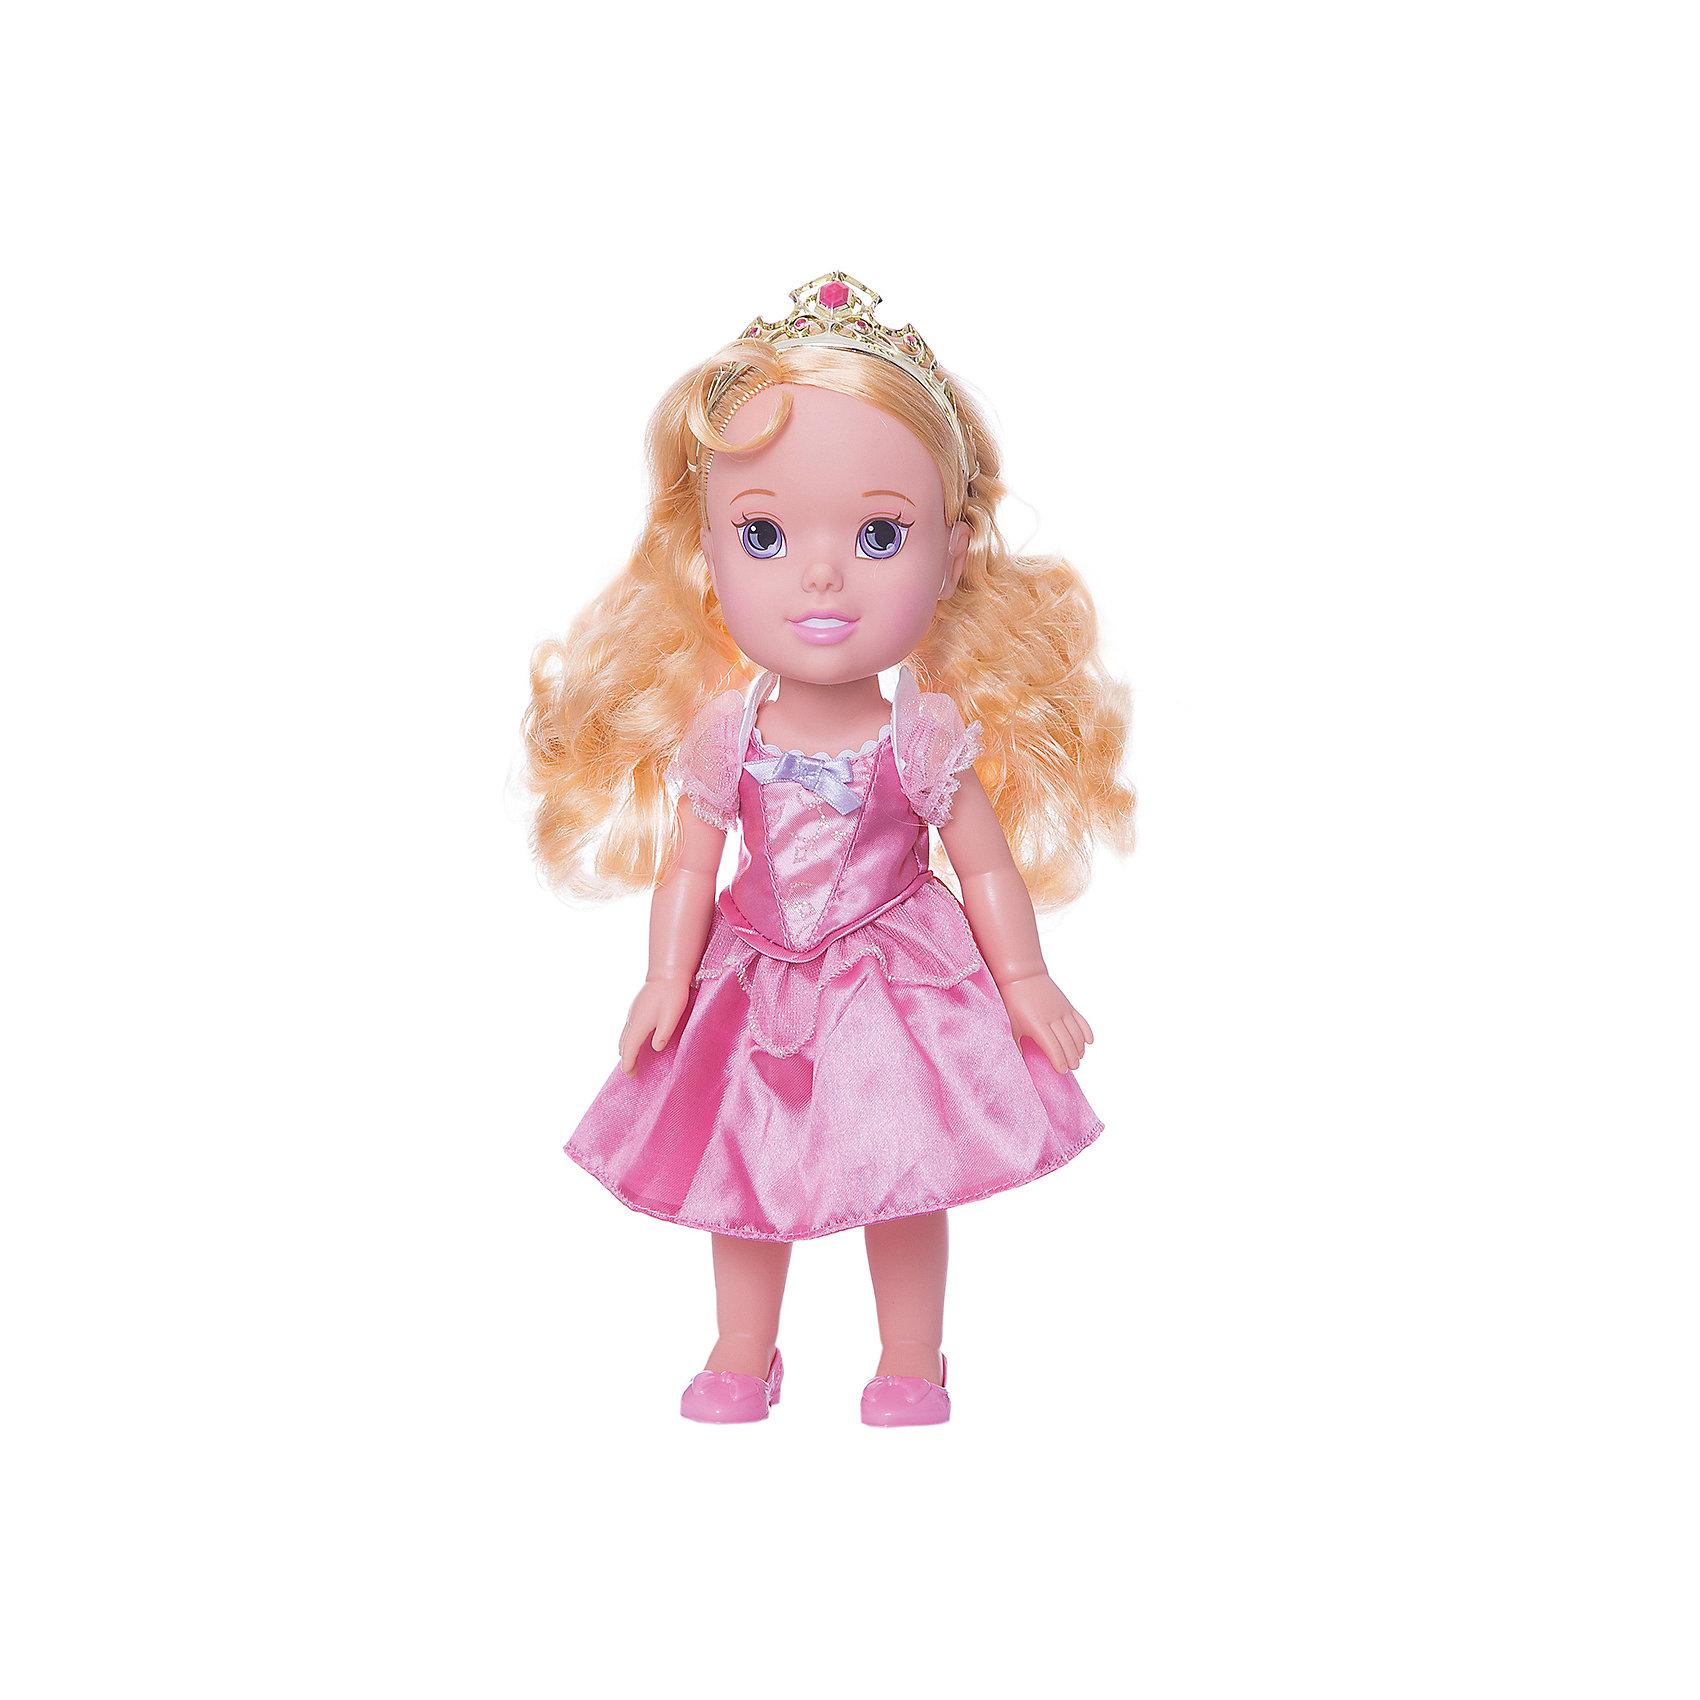 Jakks Pacific Кукла-малышка Принцессы Диснея Аврора, 31 см. кукла jakks pacific аврора